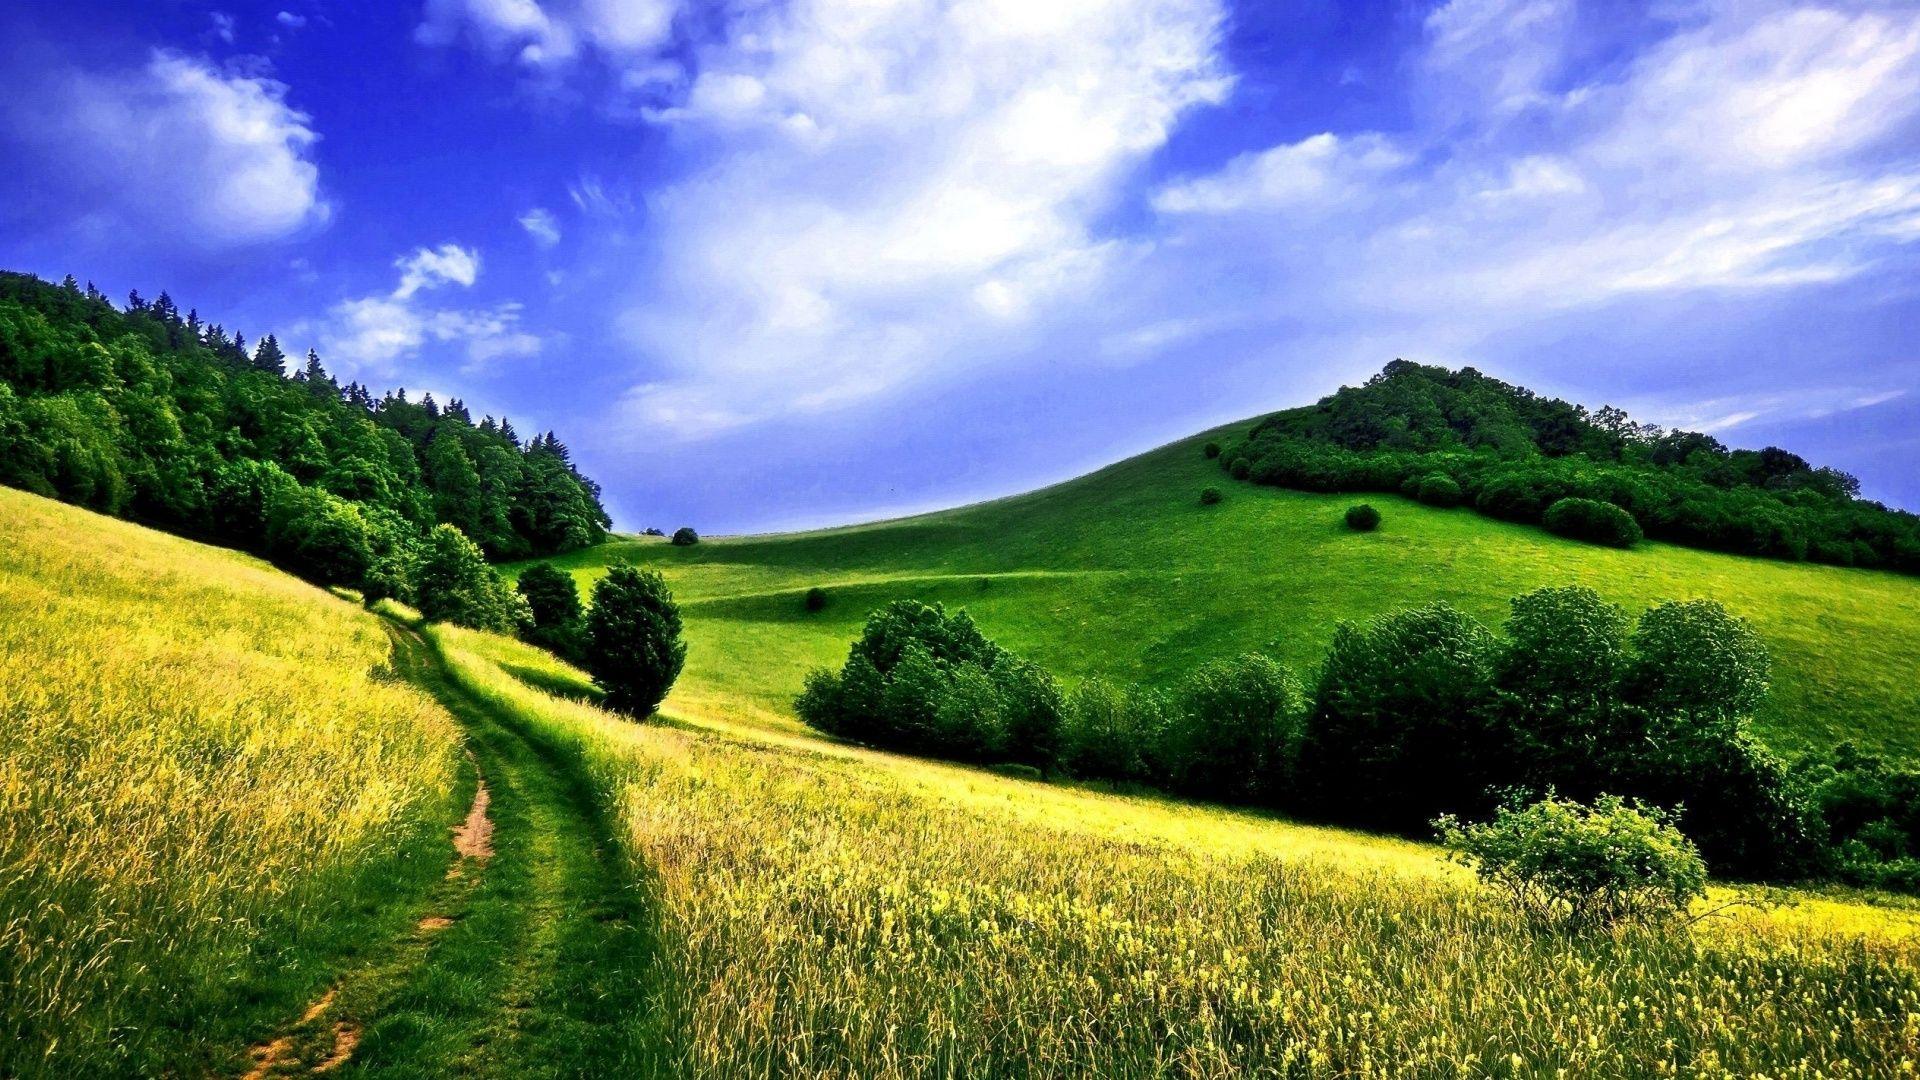 Meadow desktop wallpaper